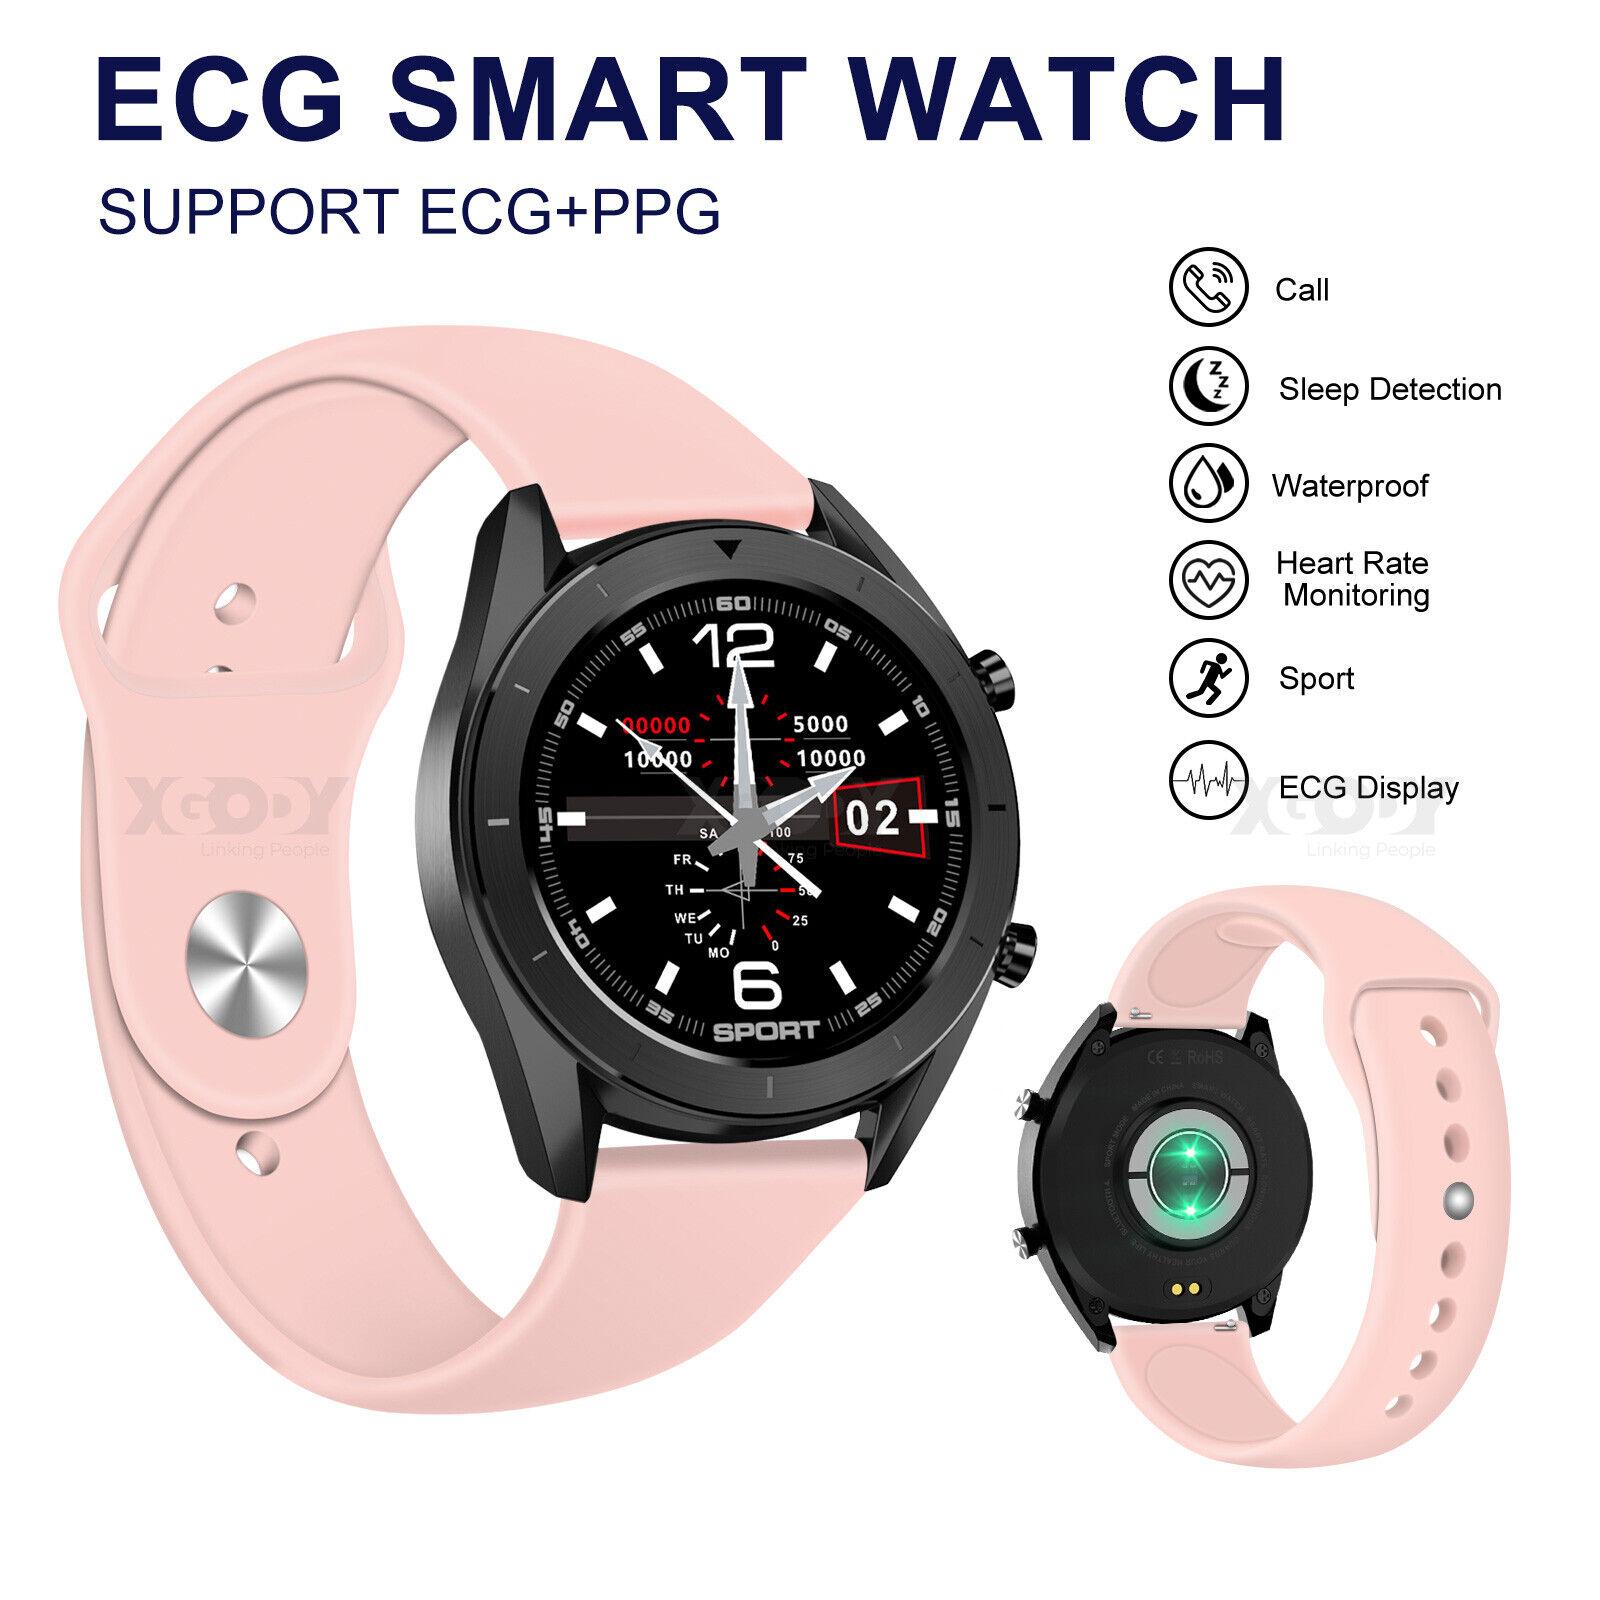 XGODY Women Girls Smart Watch ECG+PPG Heart Rate Oxygen Blood Pressure IP68 US blood Featured girls heart oxygen pressure rate smart watch women xgody